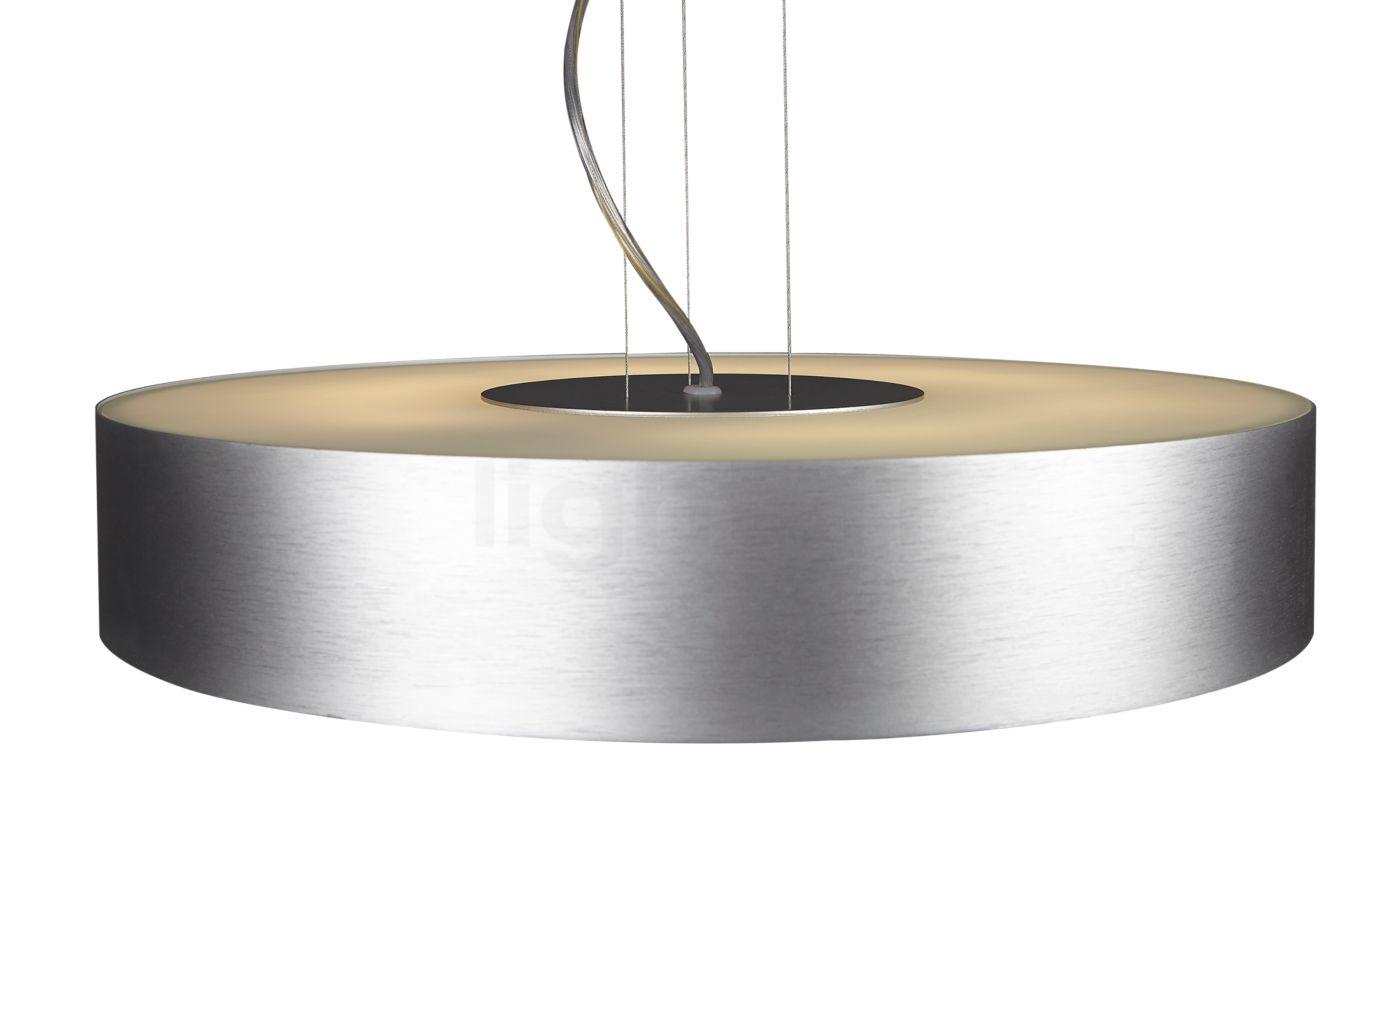 Plafoniere Ufficio Philips : Philips ecomoods fair lampada a sospensione light11.it